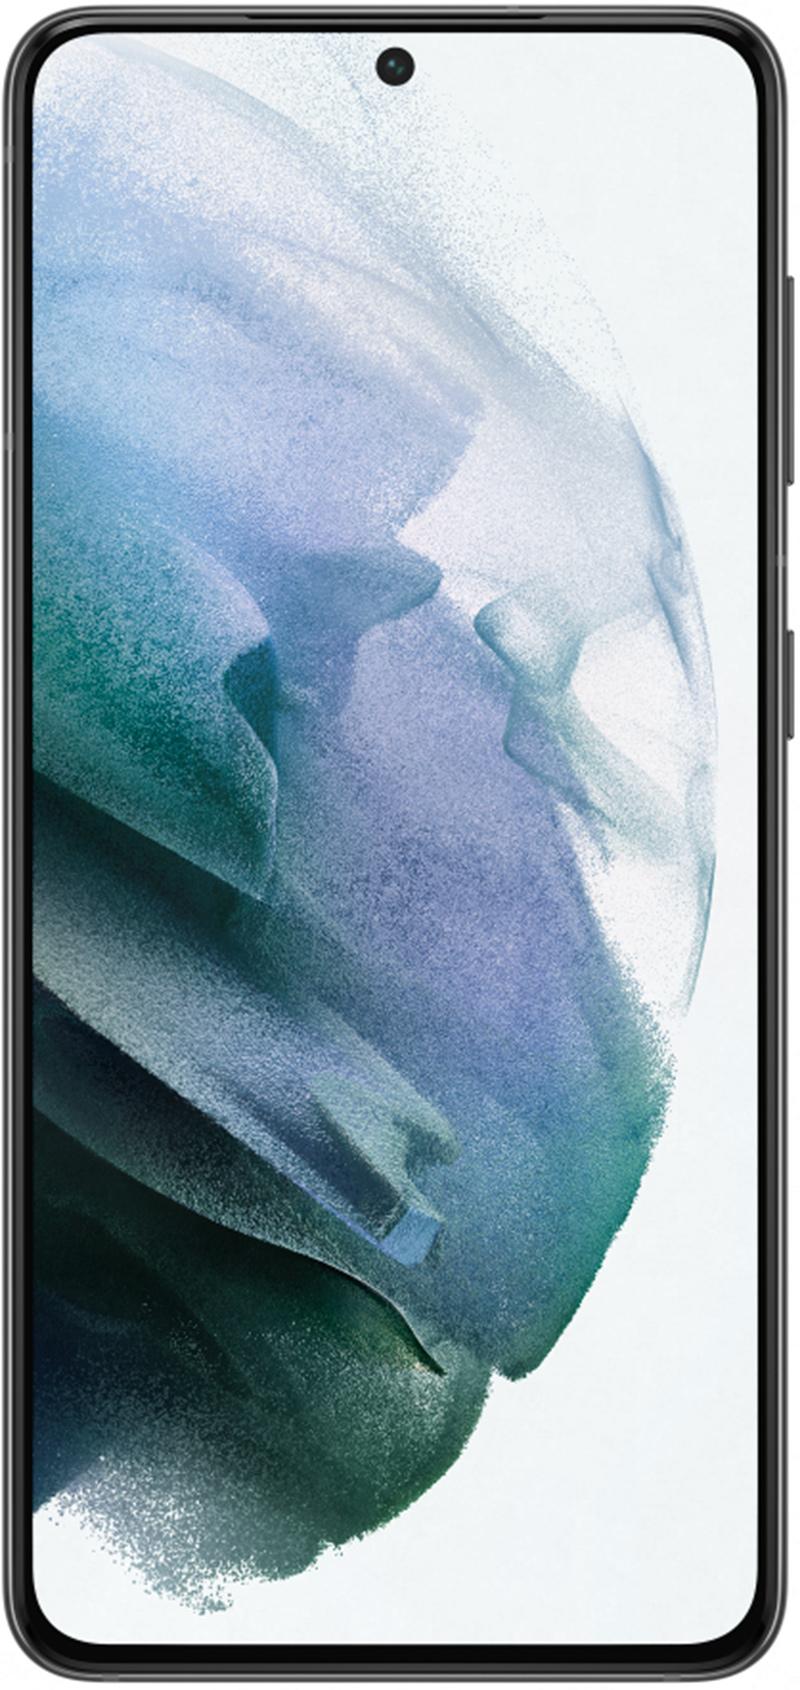 Samsung Galaxy S21 Plus 5G noir 128Go